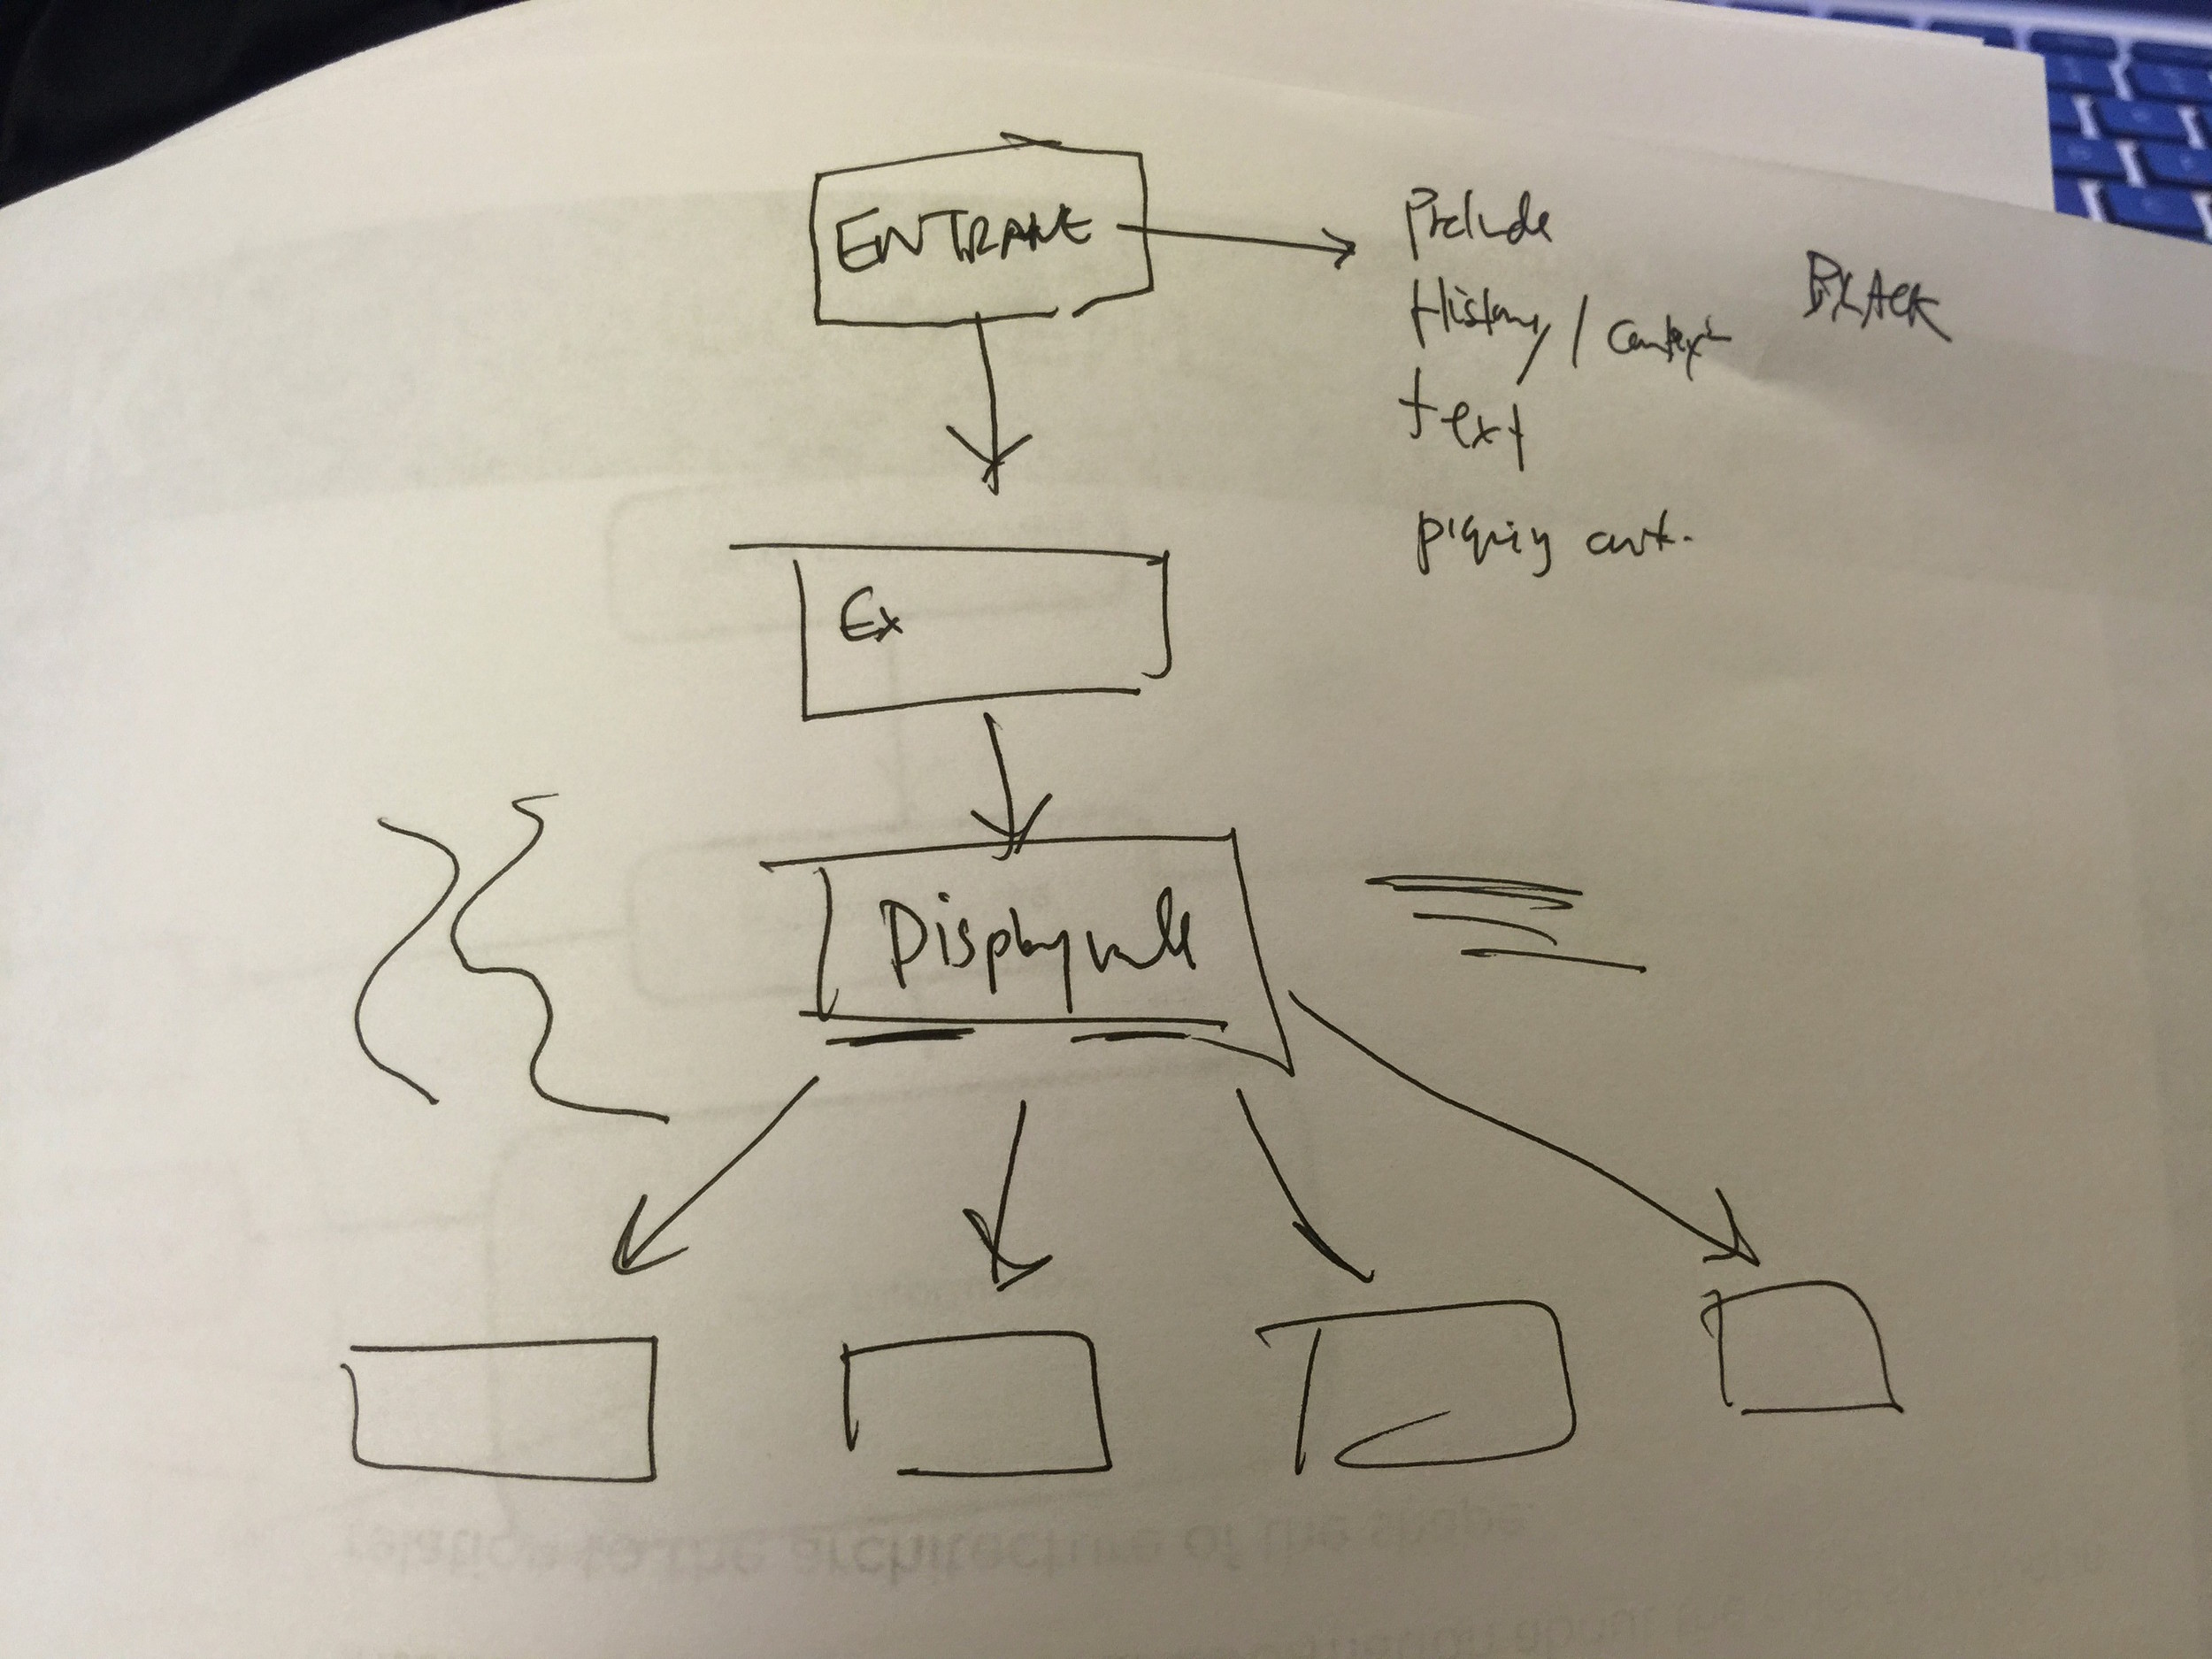 Sketch of Flow through Location